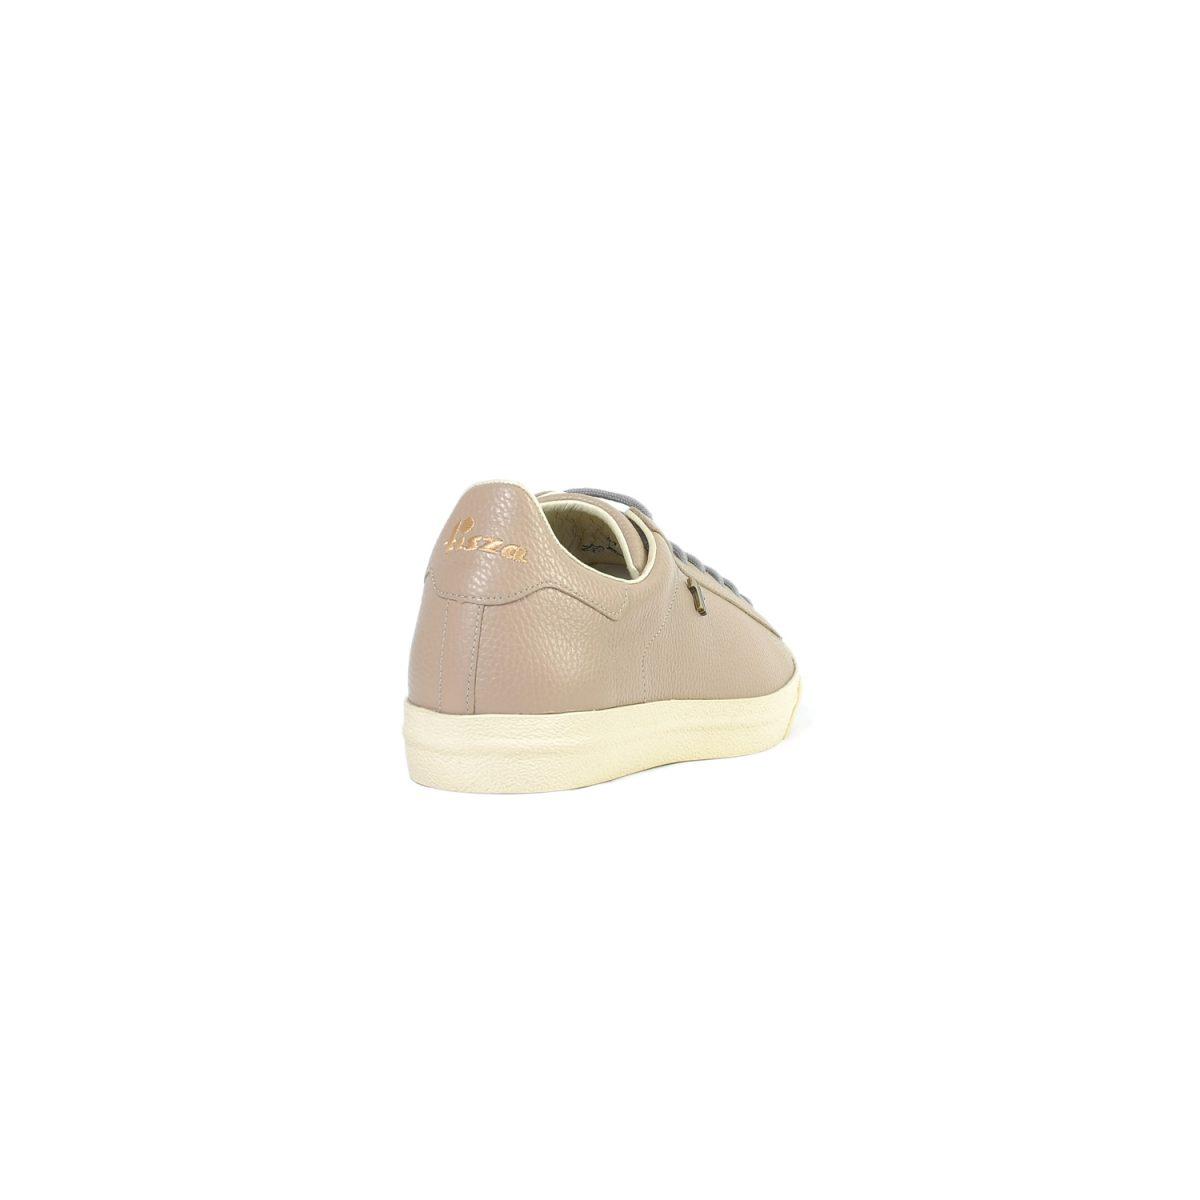 Tisza cipő - Simple - Homok